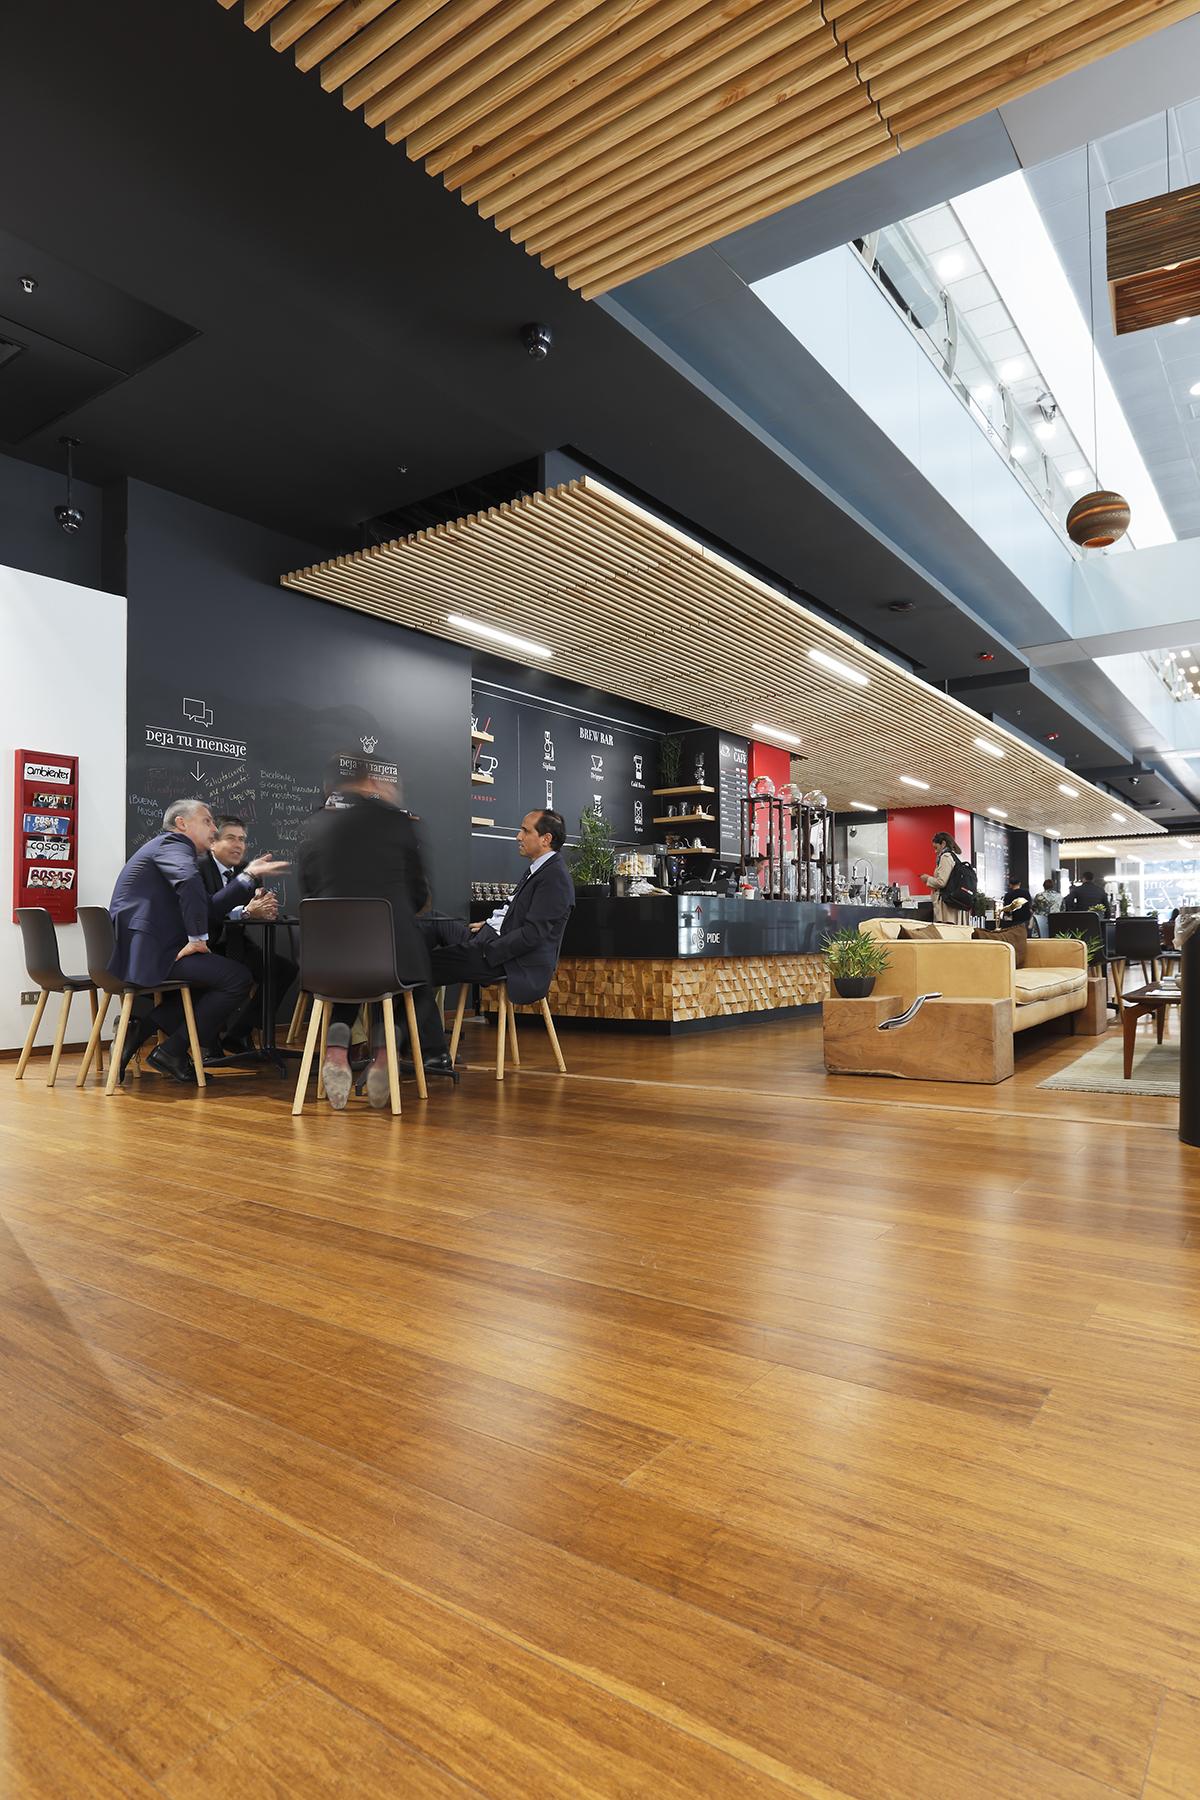 Quadrolines 15x10 30x15 productos interiores pisos for Pisos banco santander